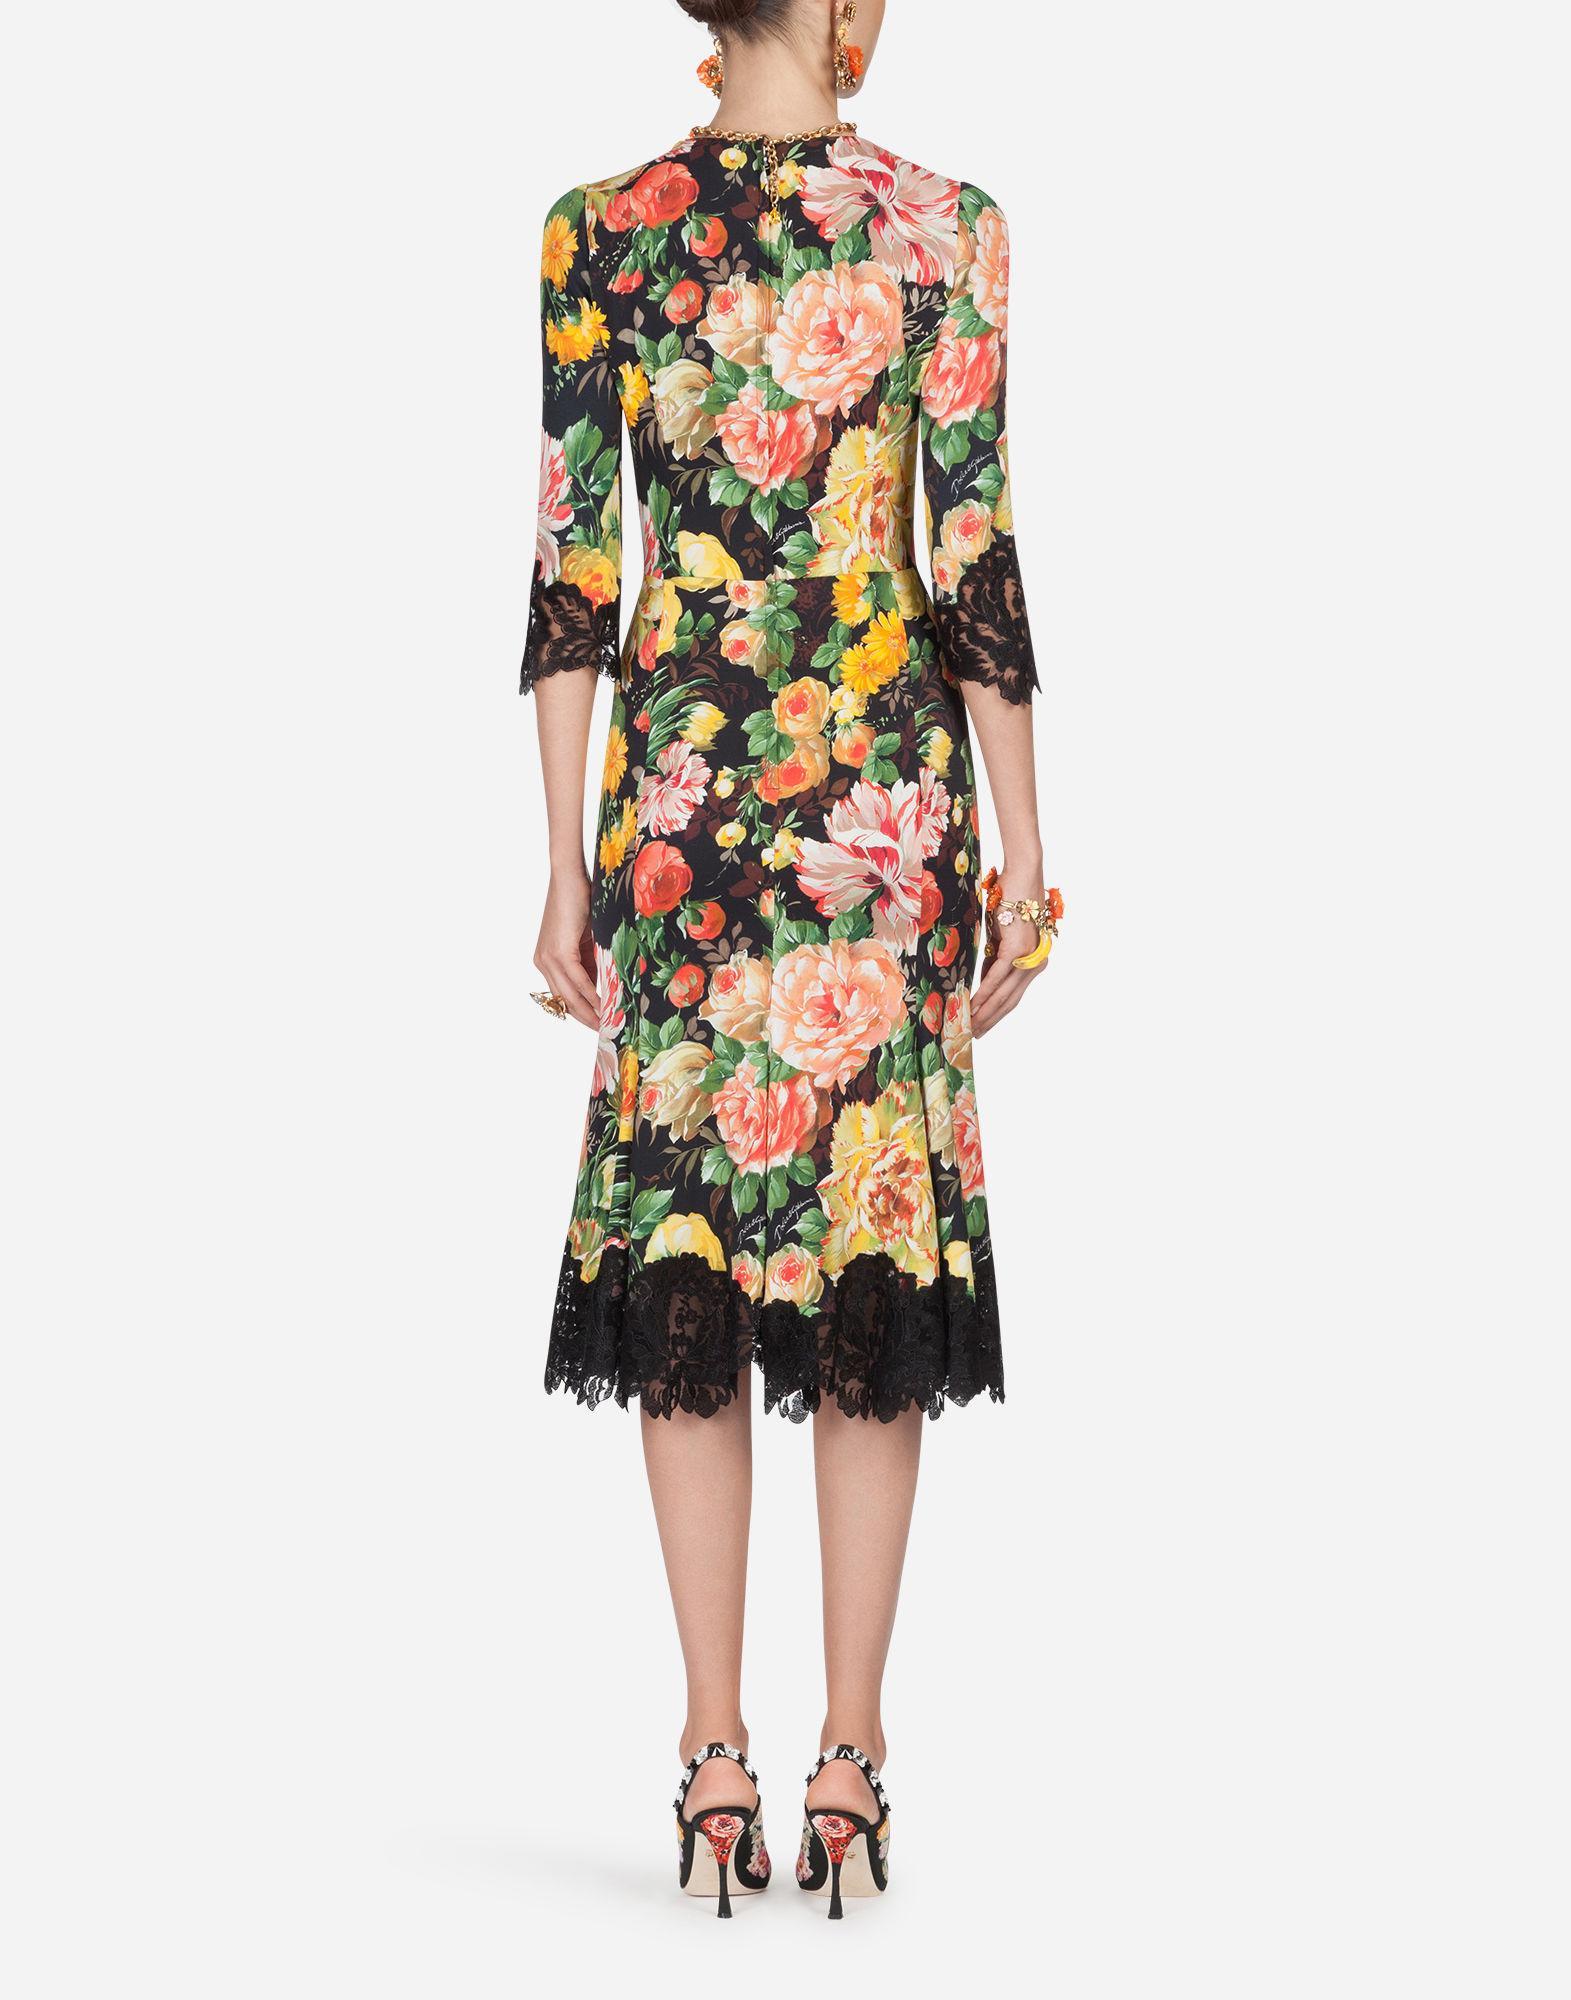 ea98edf9 Lyst - Dolce & Gabbana Dress In Printed Viscose